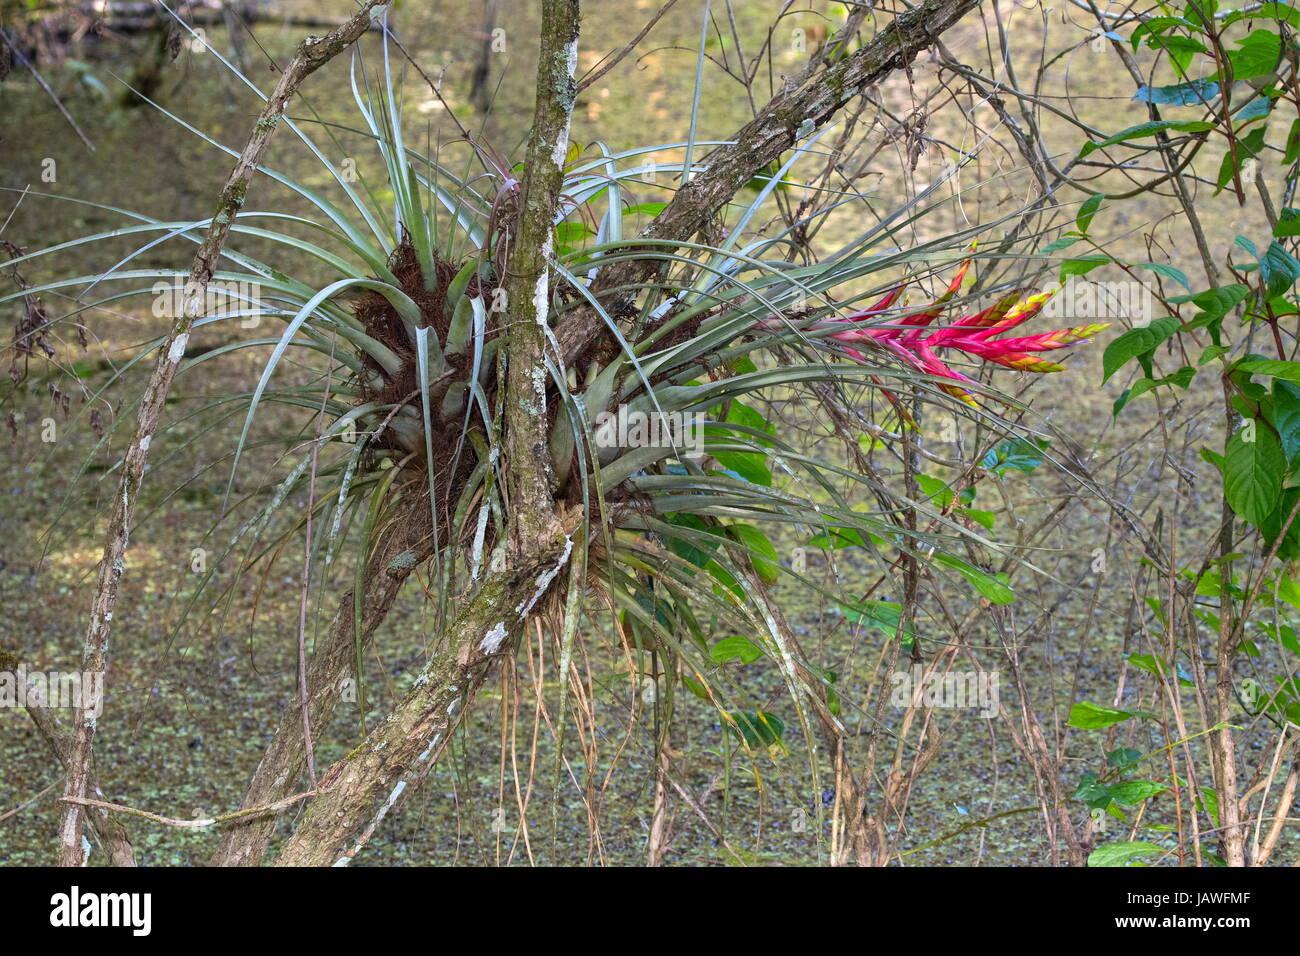 The Cardinal Airplant Tillandsia Fasciculata Is A Bromeliad